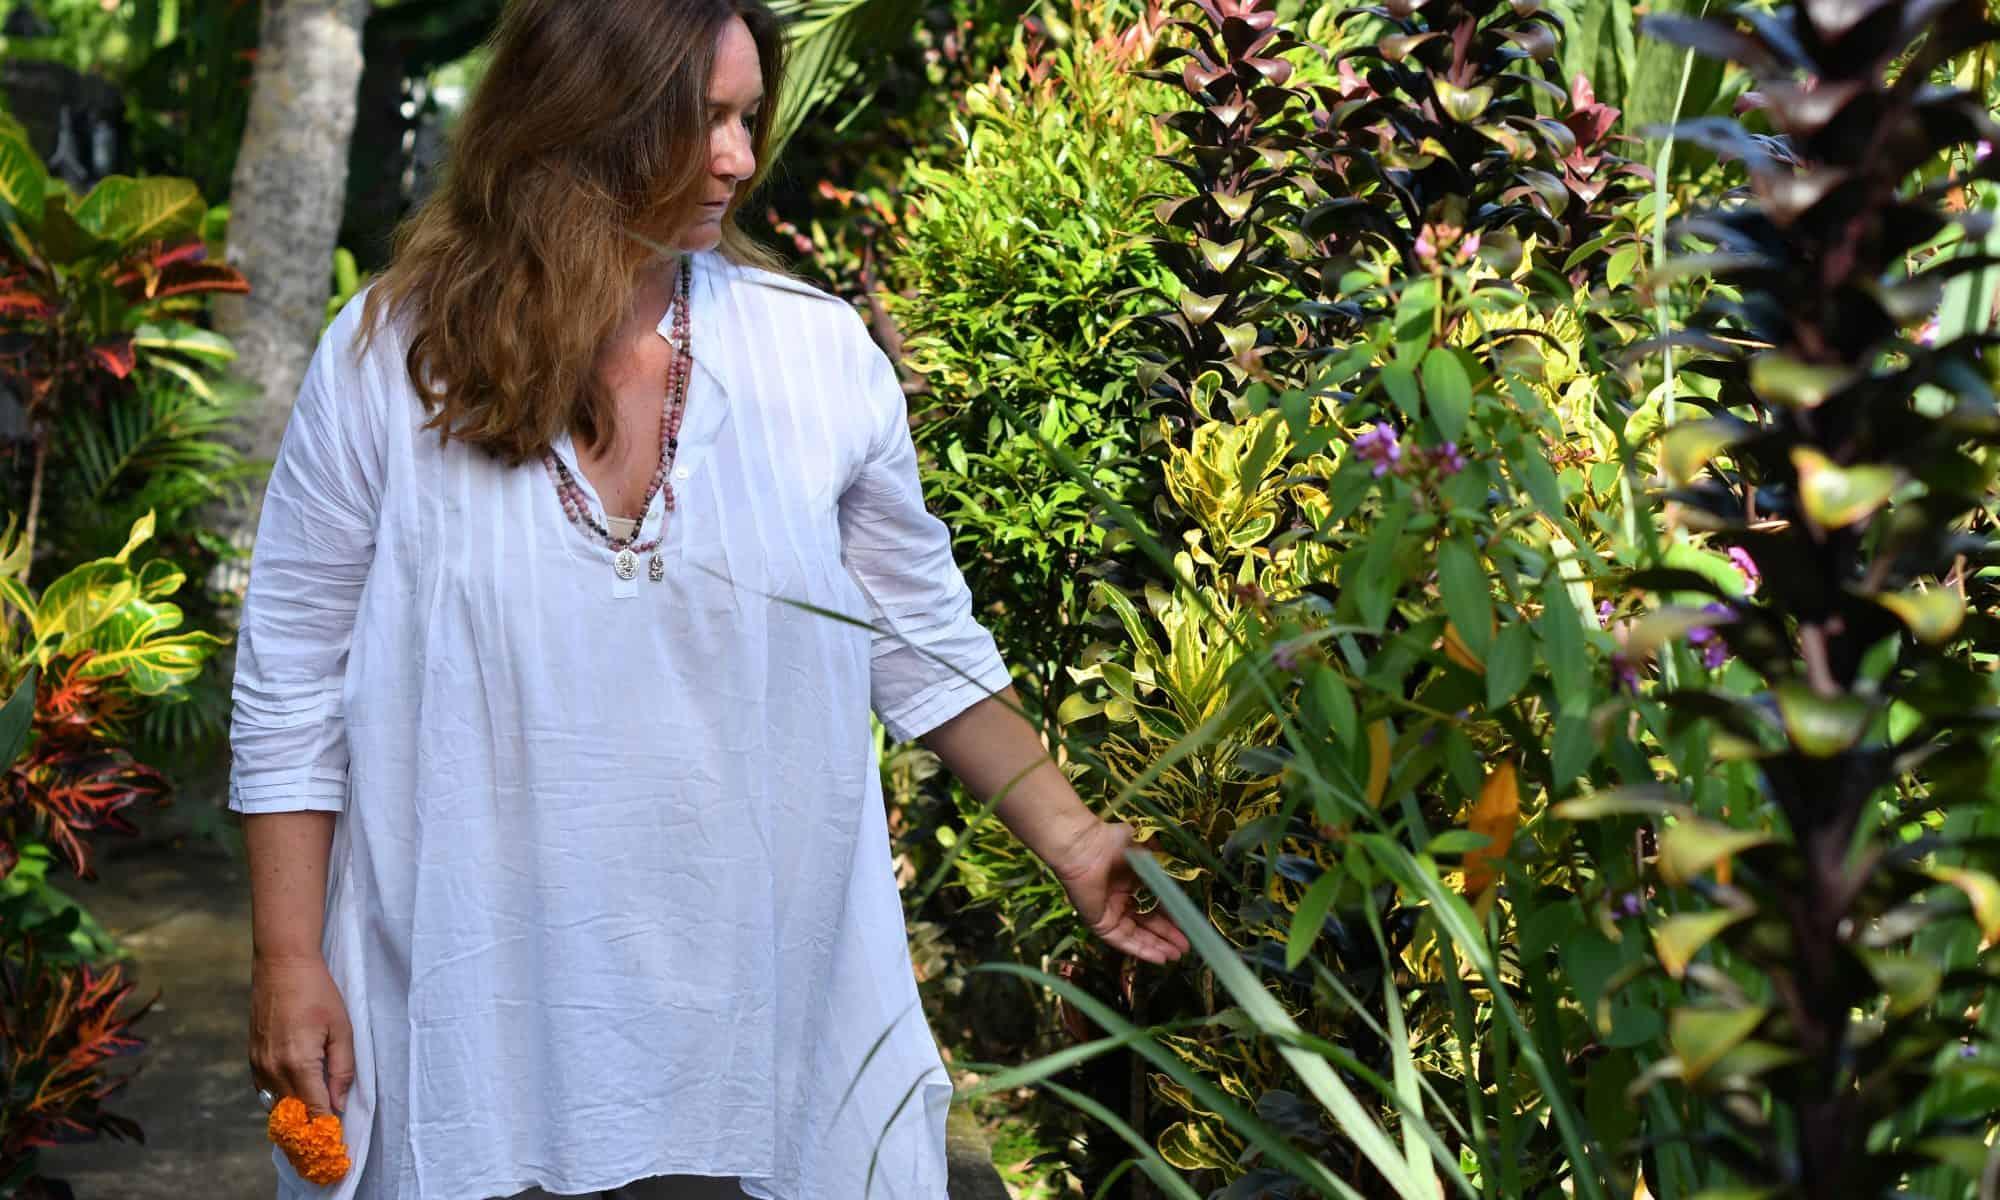 Mia in Bali eine Pflanze berührend